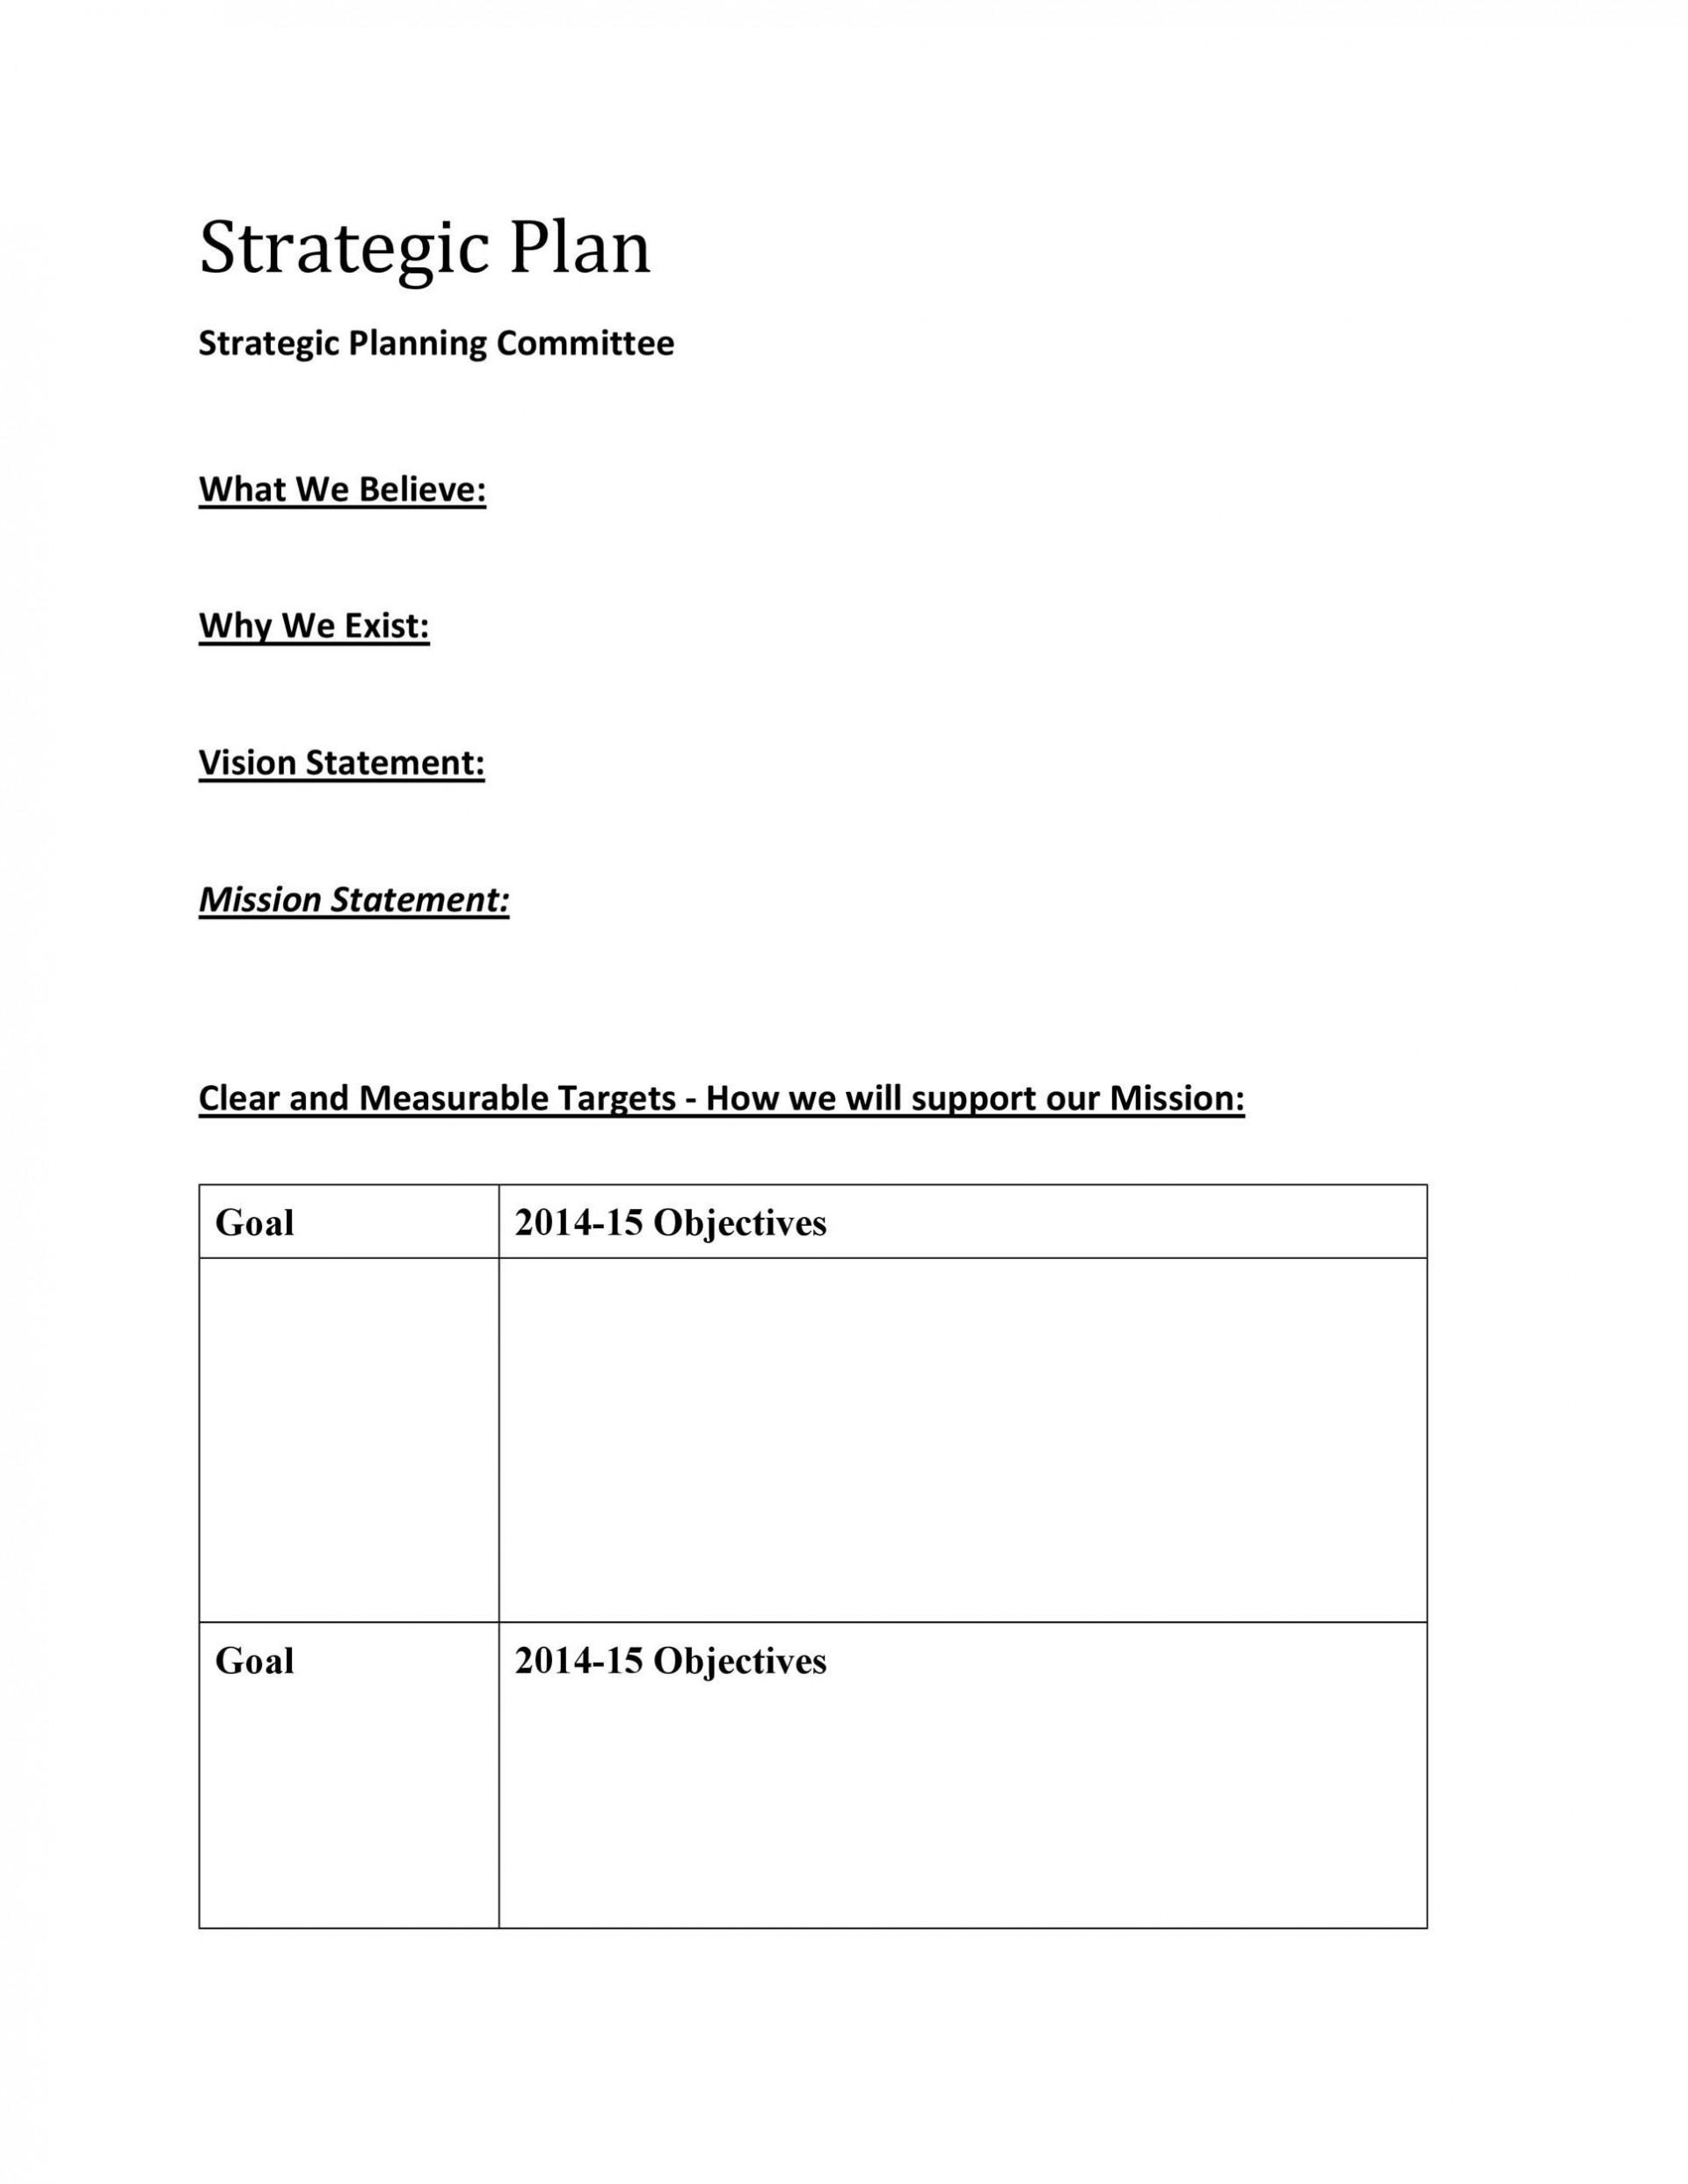 009 Shocking Strategic Plan Outline Template Photo  Marketing1920